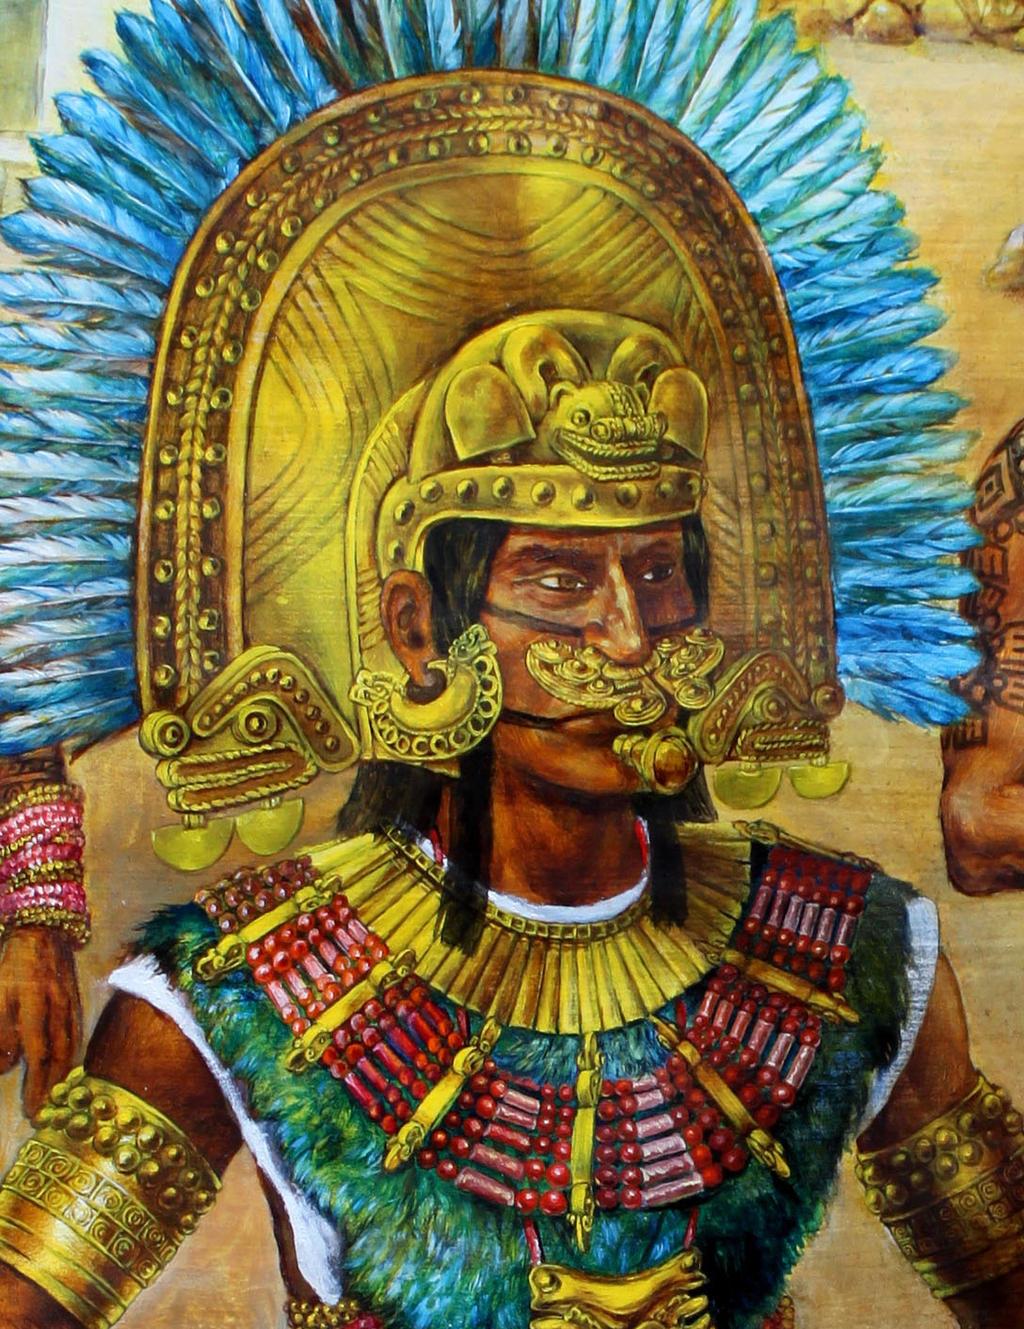 Tairona Chief, AD 1400